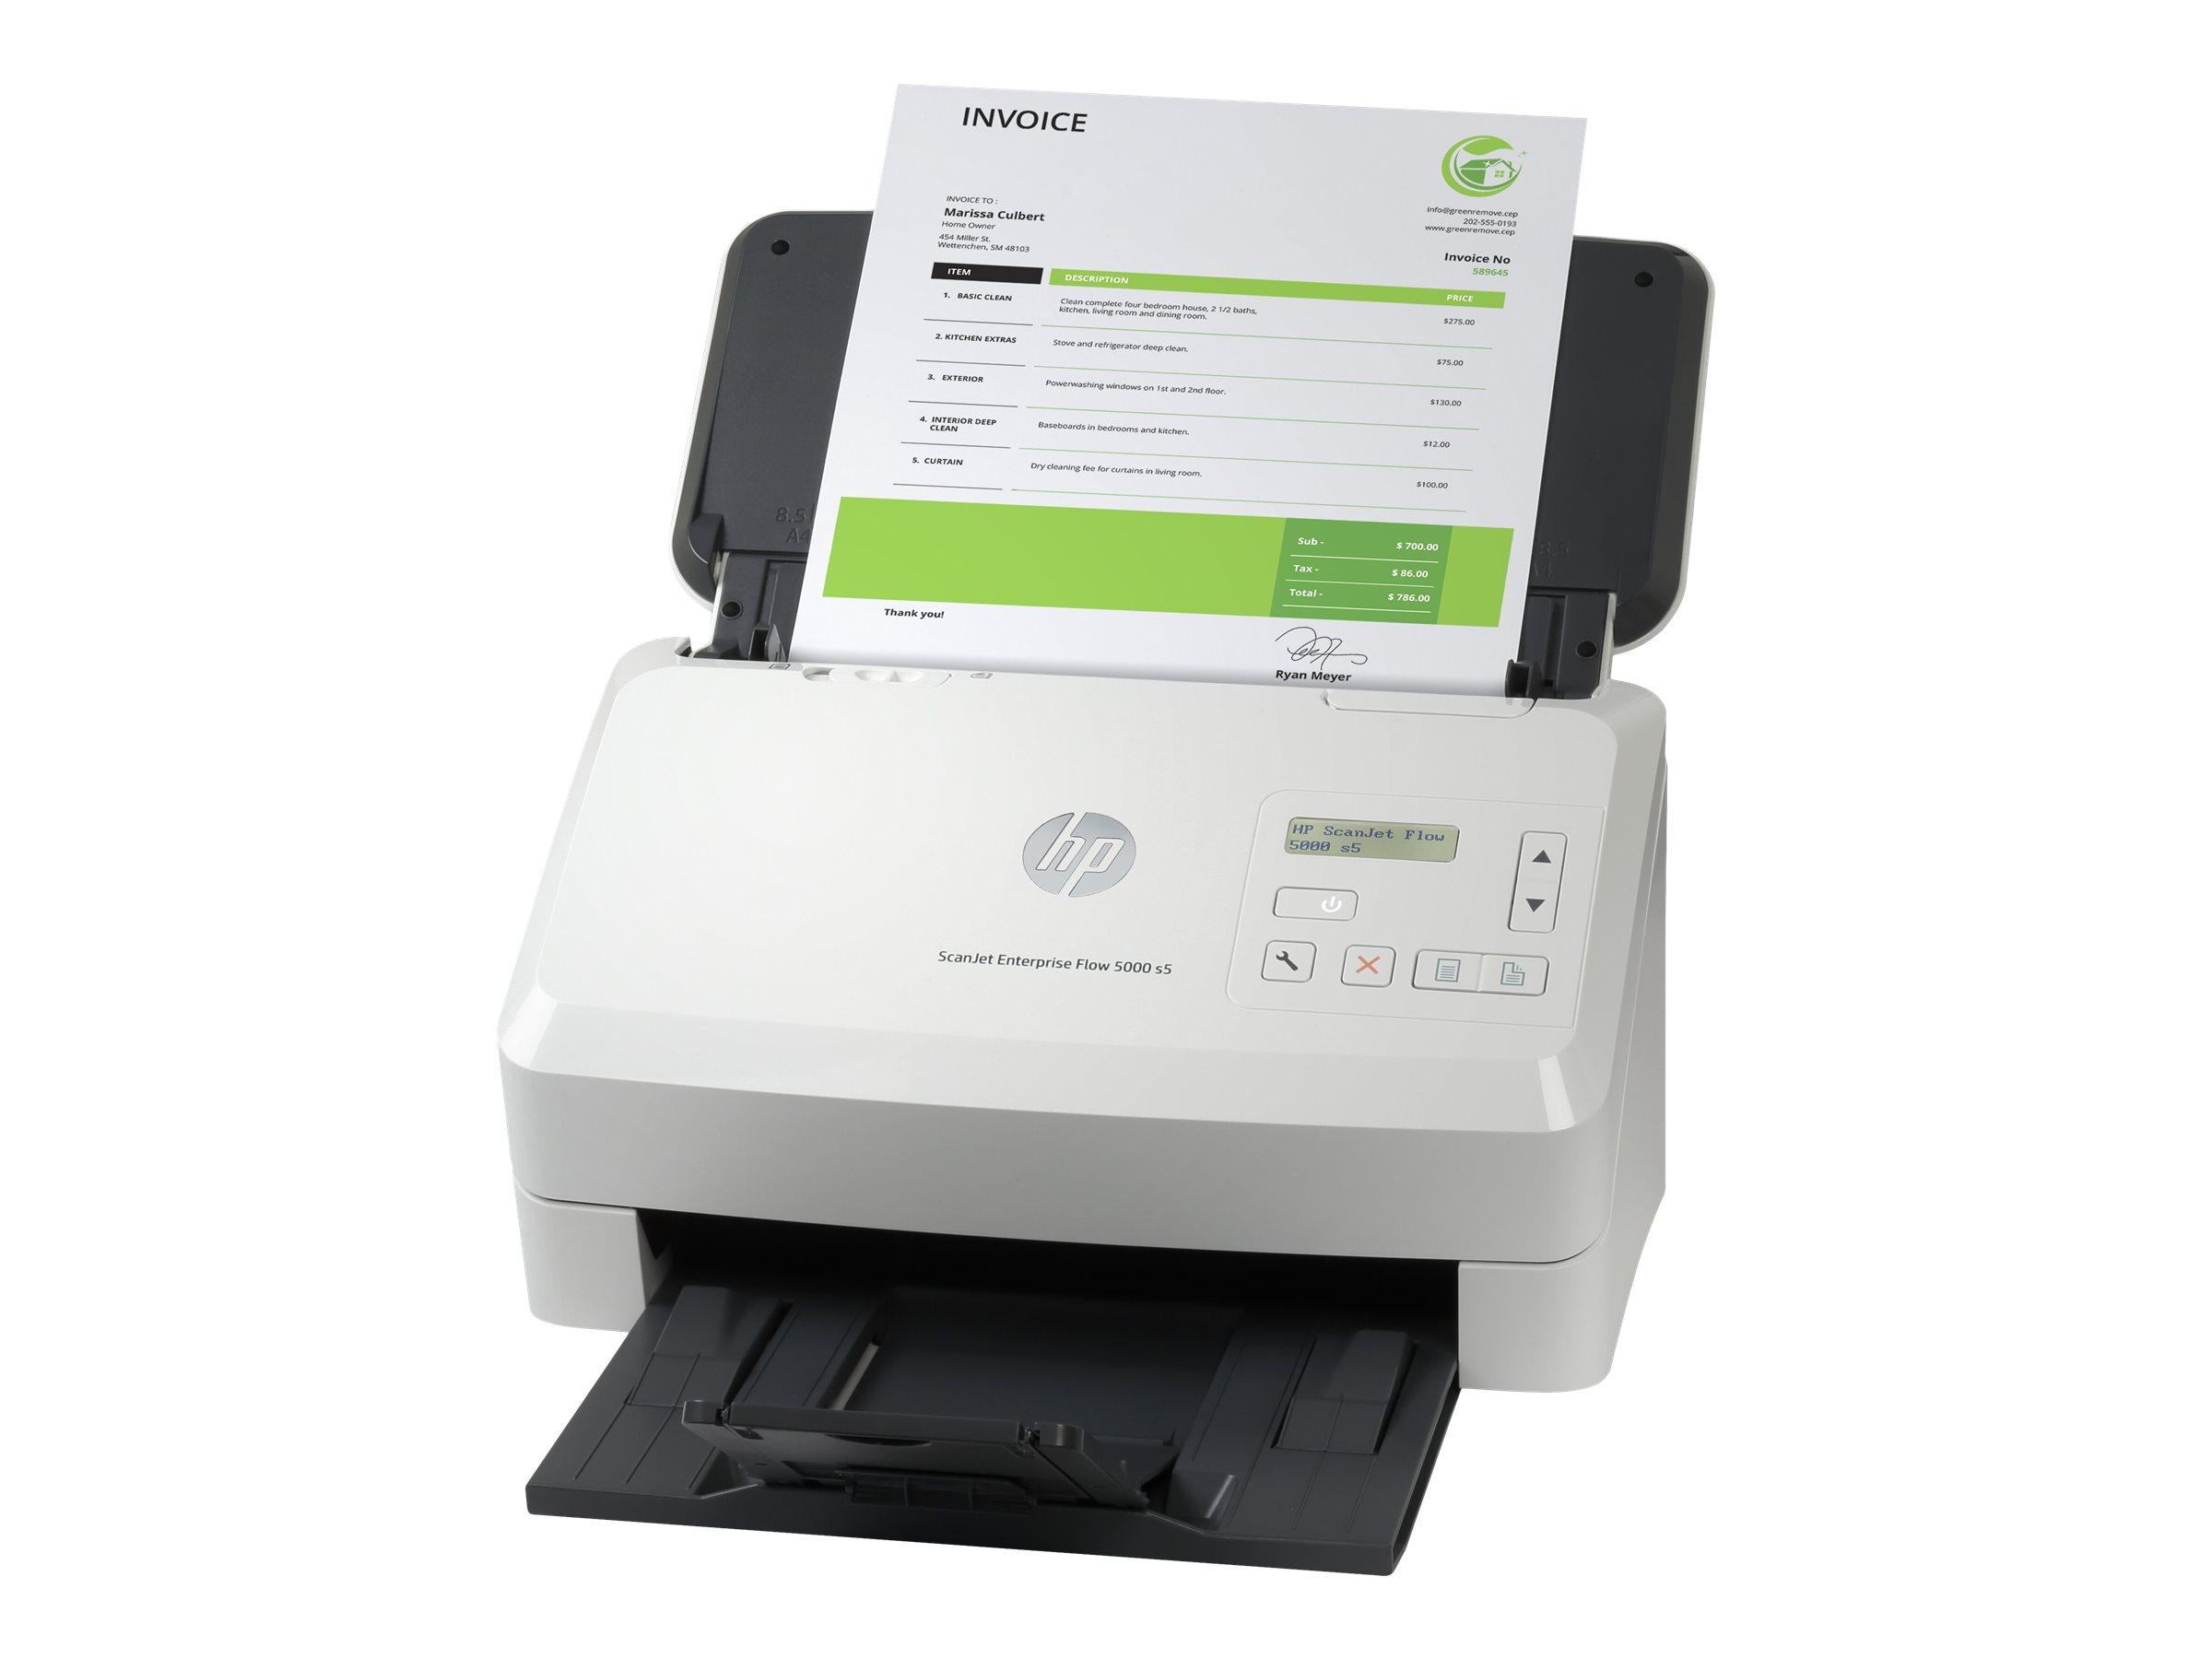 HP ScanJet Enterprise Flow 5000 s5 - Dokumentenscanner - CMOS / CIS - Duplex - 216 x 3100 mm - 600 dpi x 600 dpi